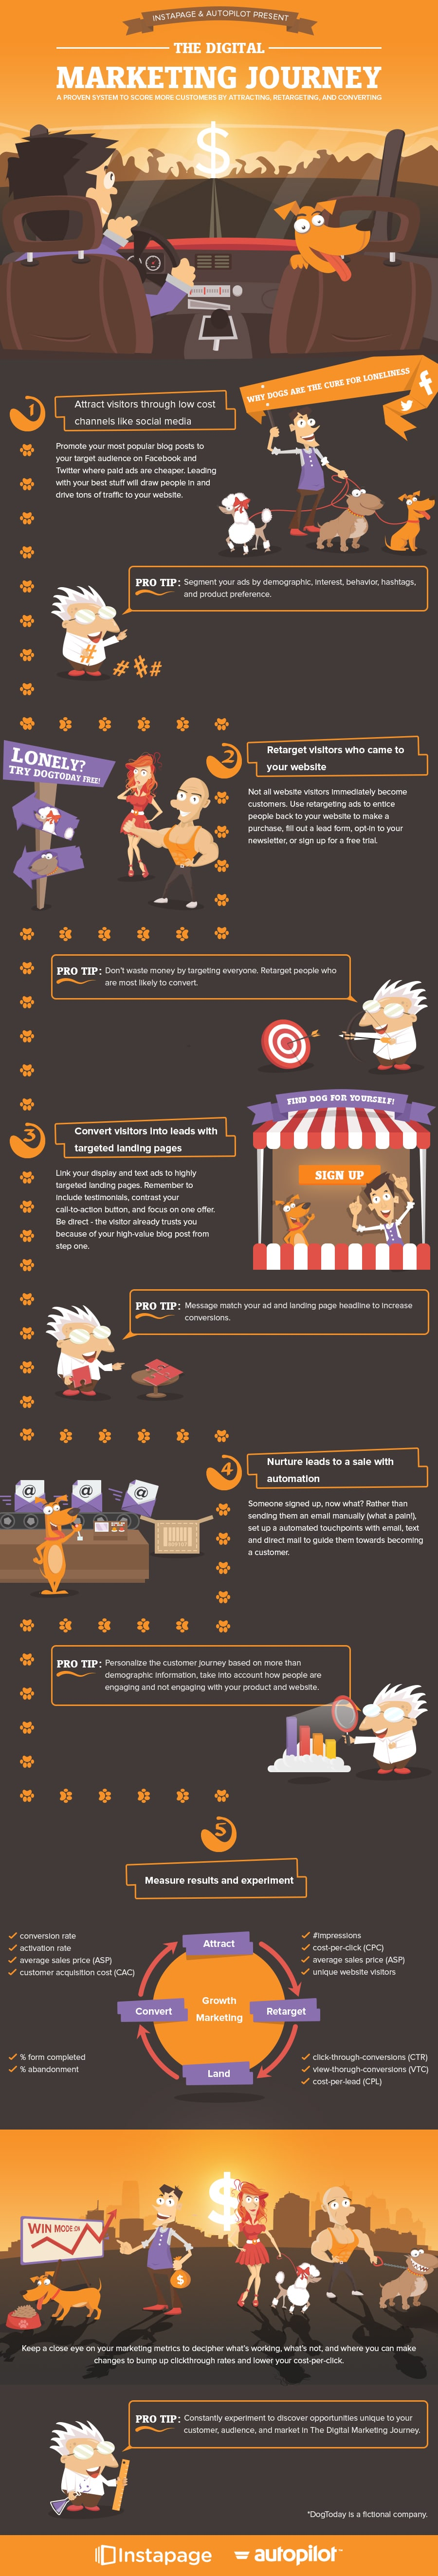 The Digital Marketing Journey